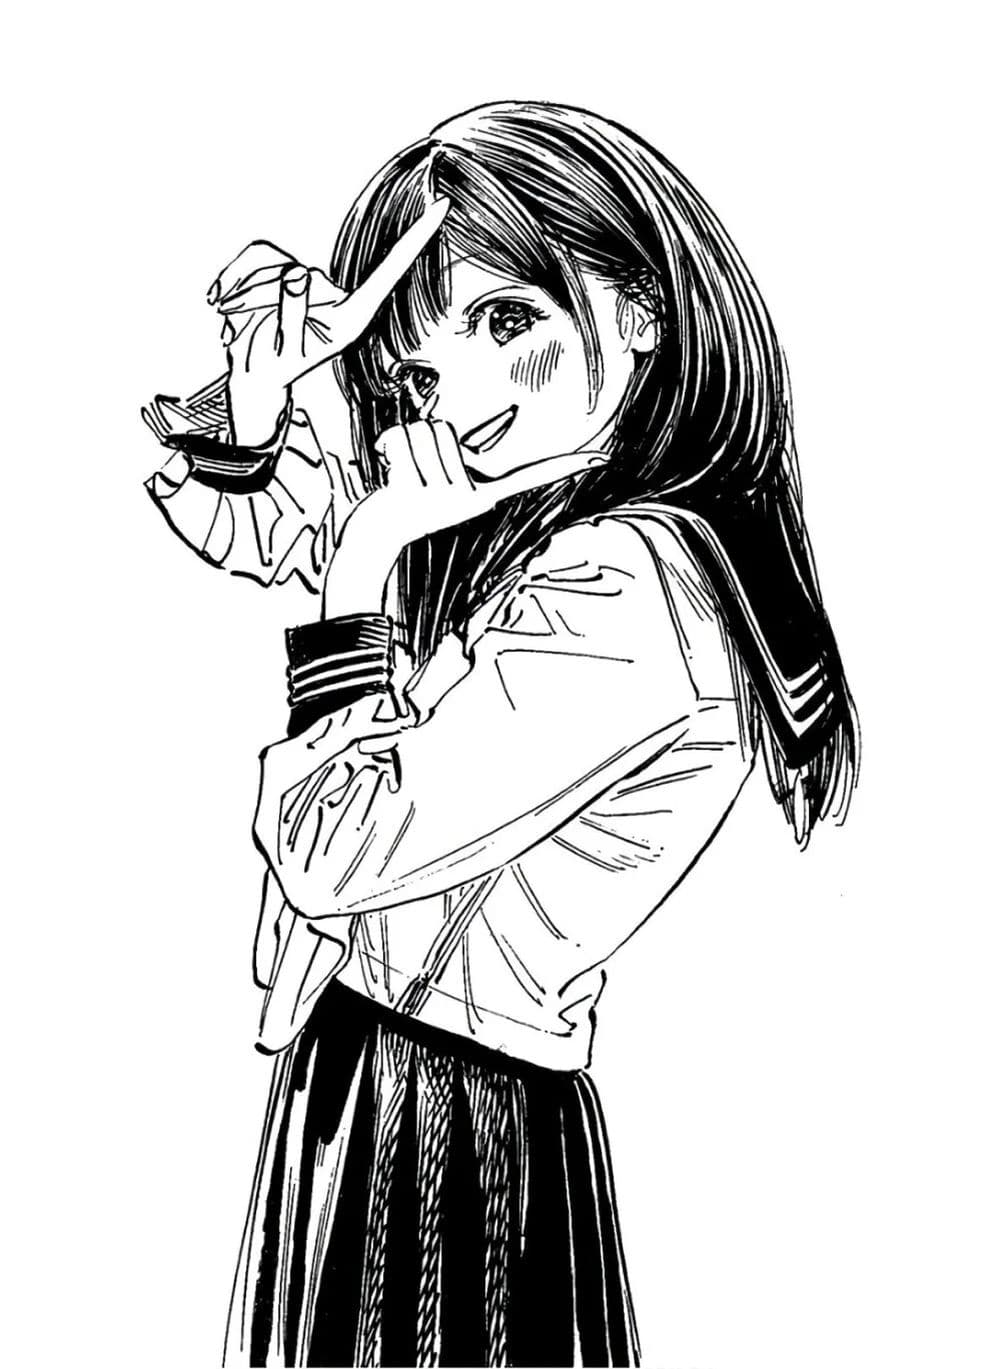 Akebi-chan no Sailor Fuku-ตอนที่ 38